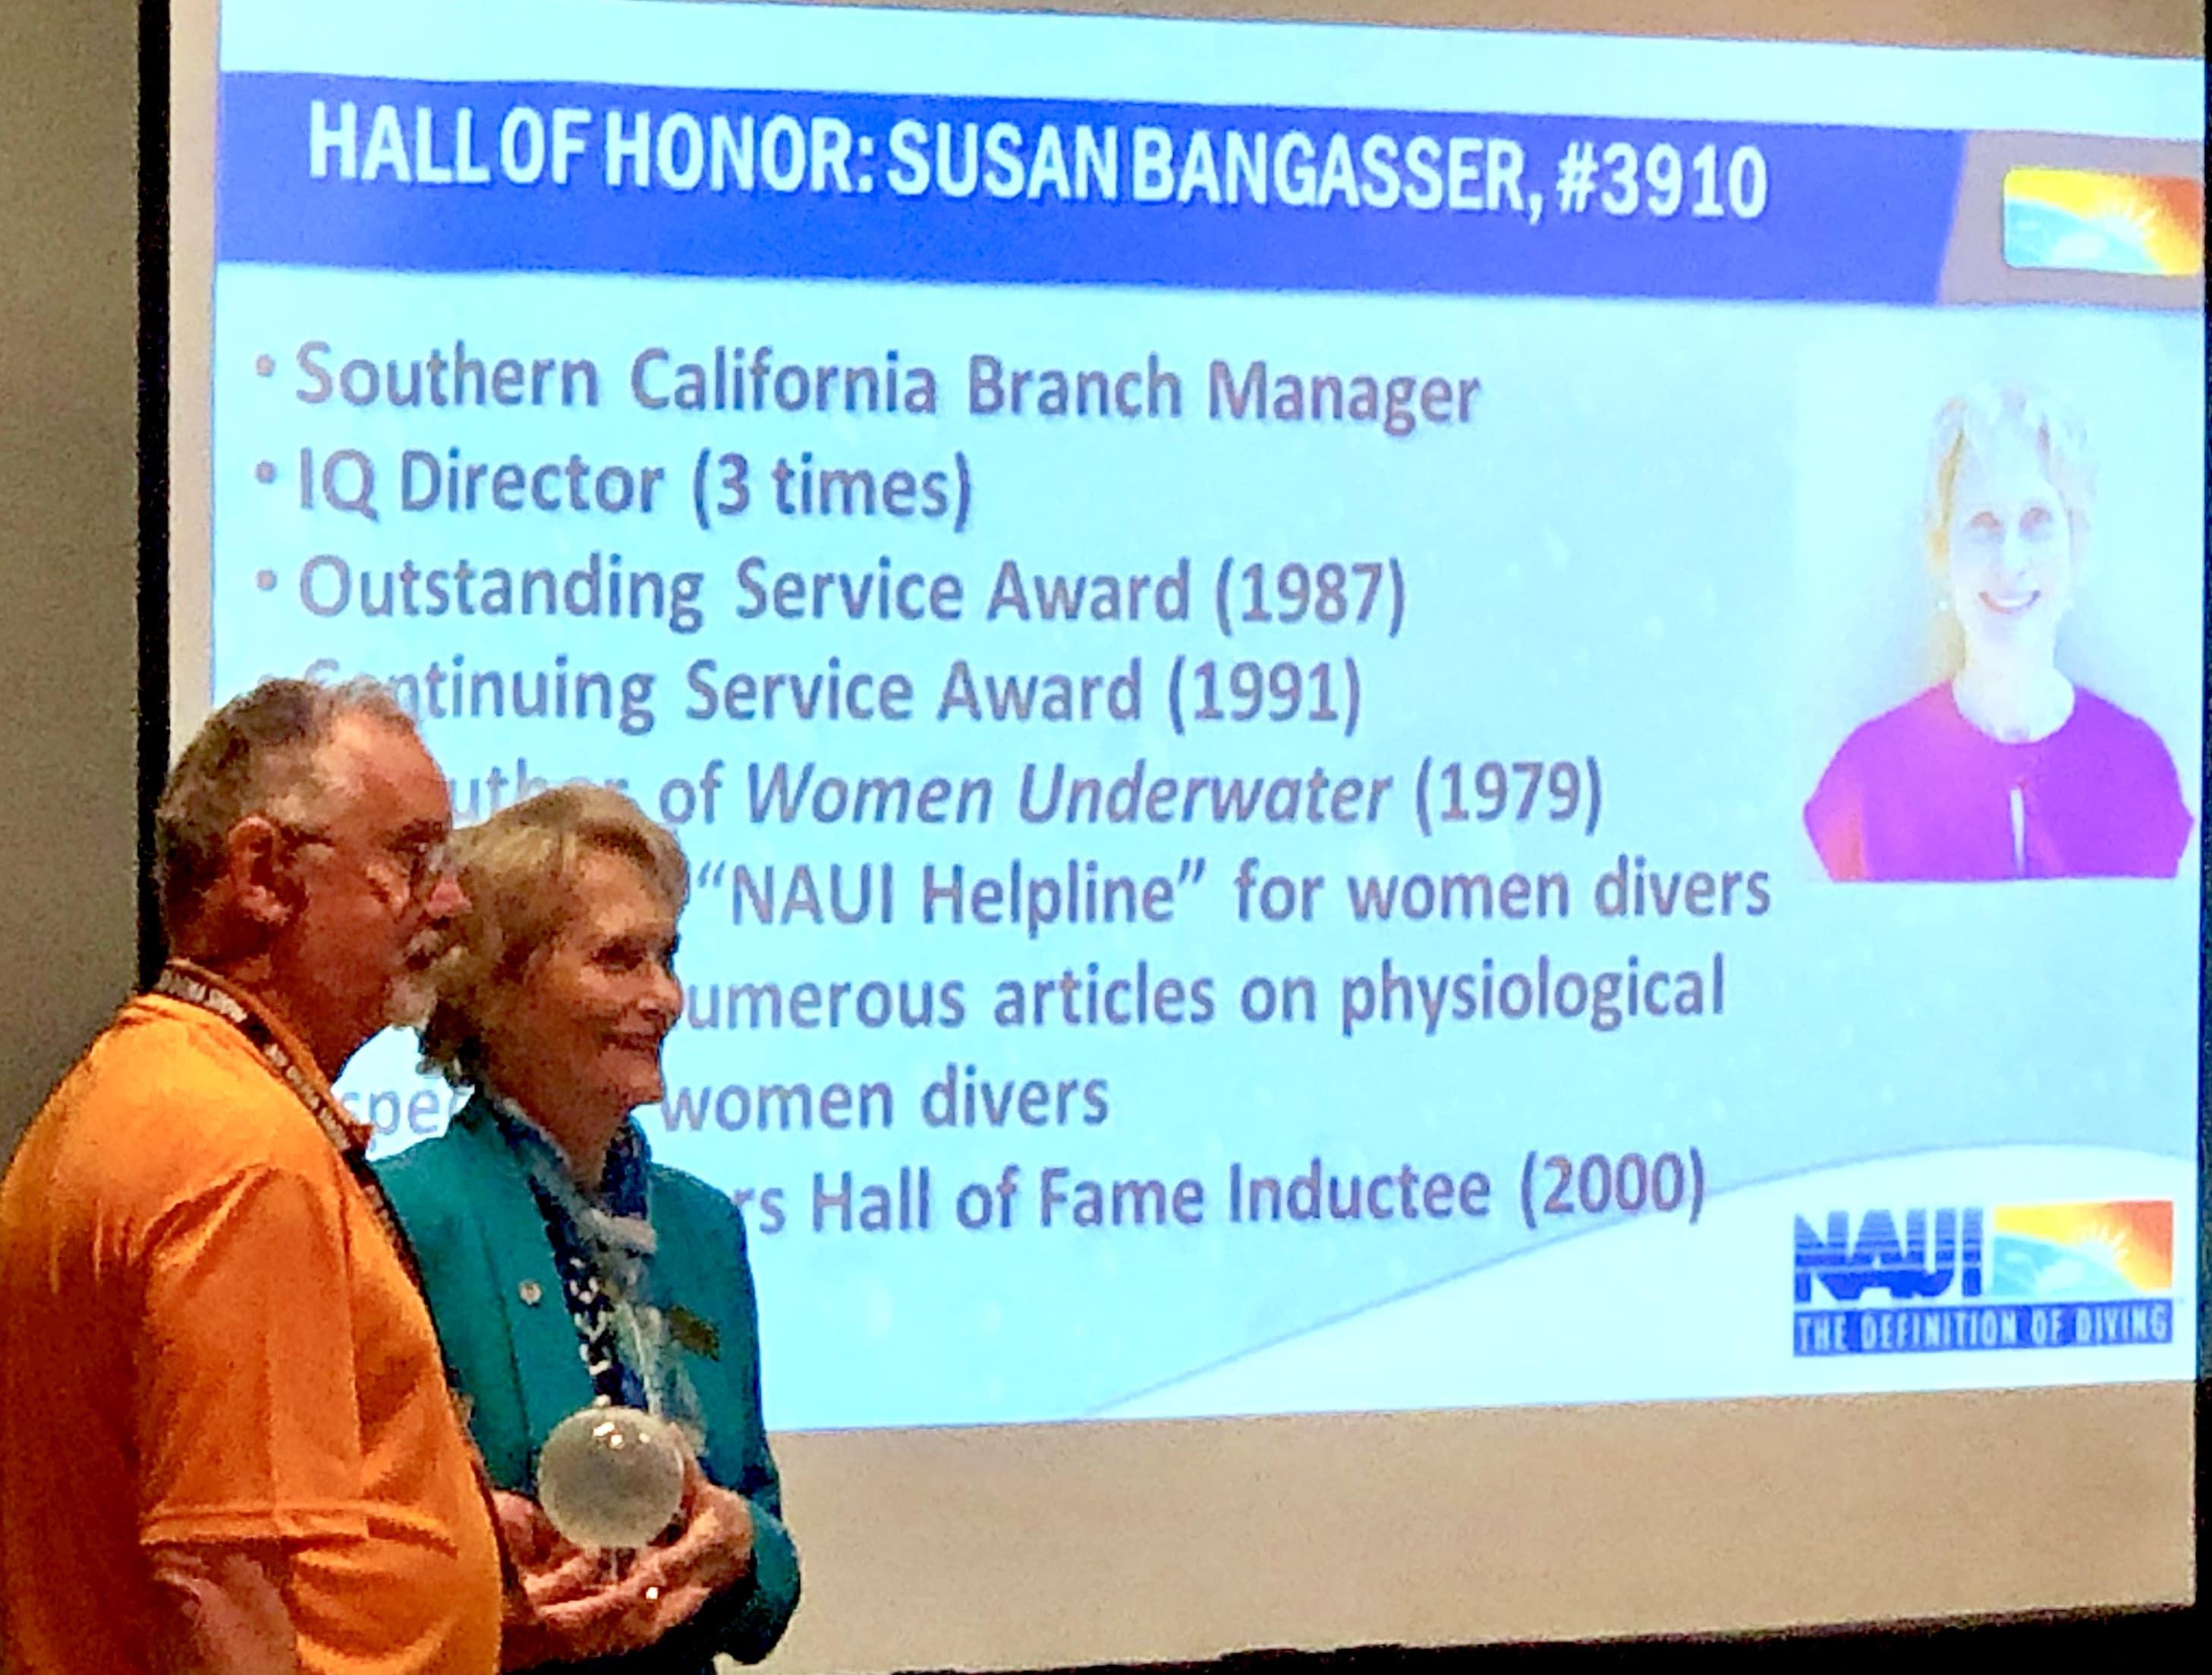 NAUI Awardee Susan Bangasser at DEMA Show 2018